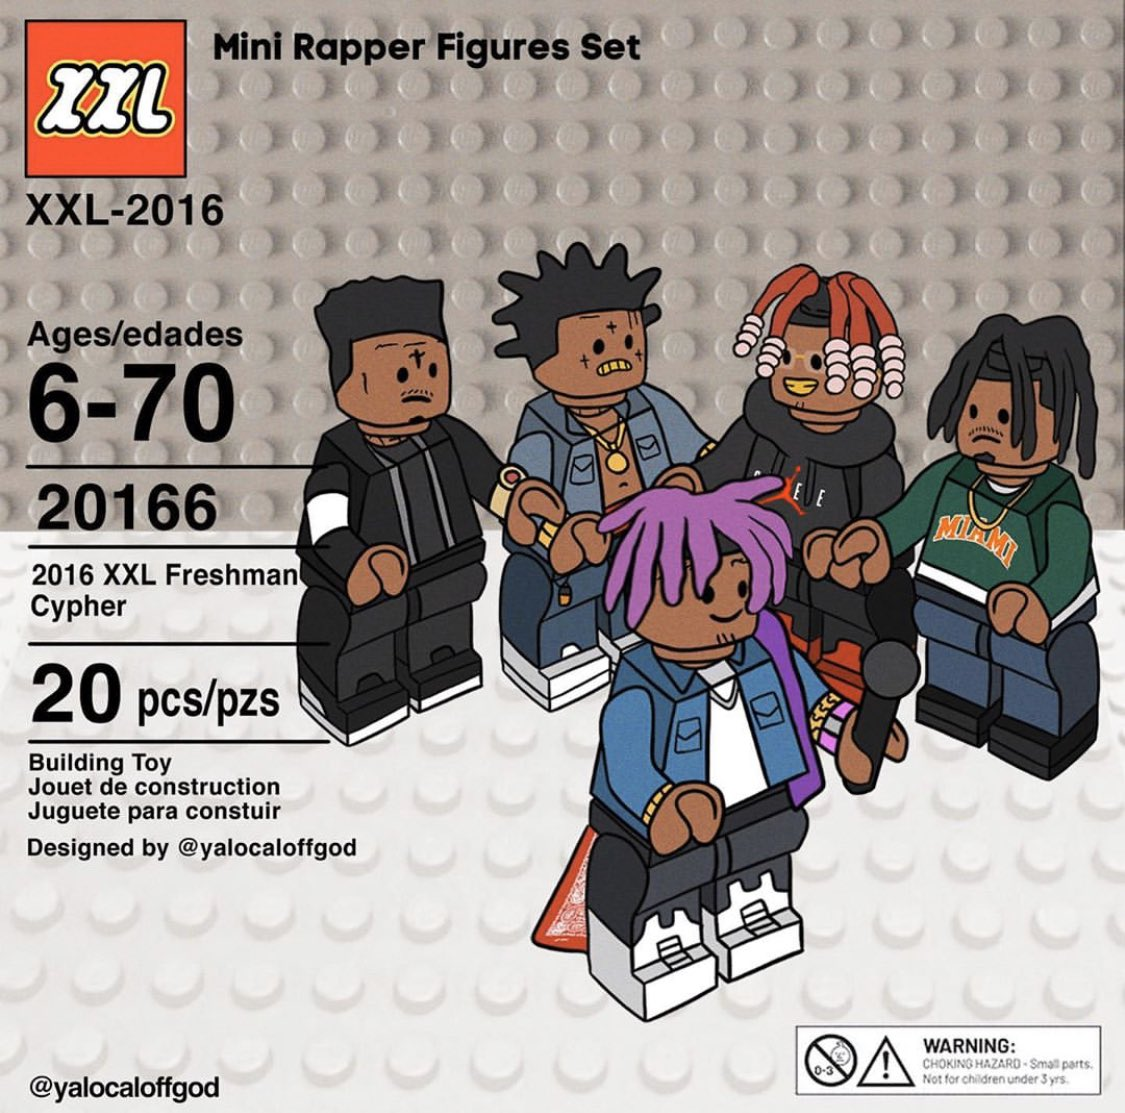 AYYYE LEGOOO 🗣🗣🗣 🎨 IG: yalocaloffgod